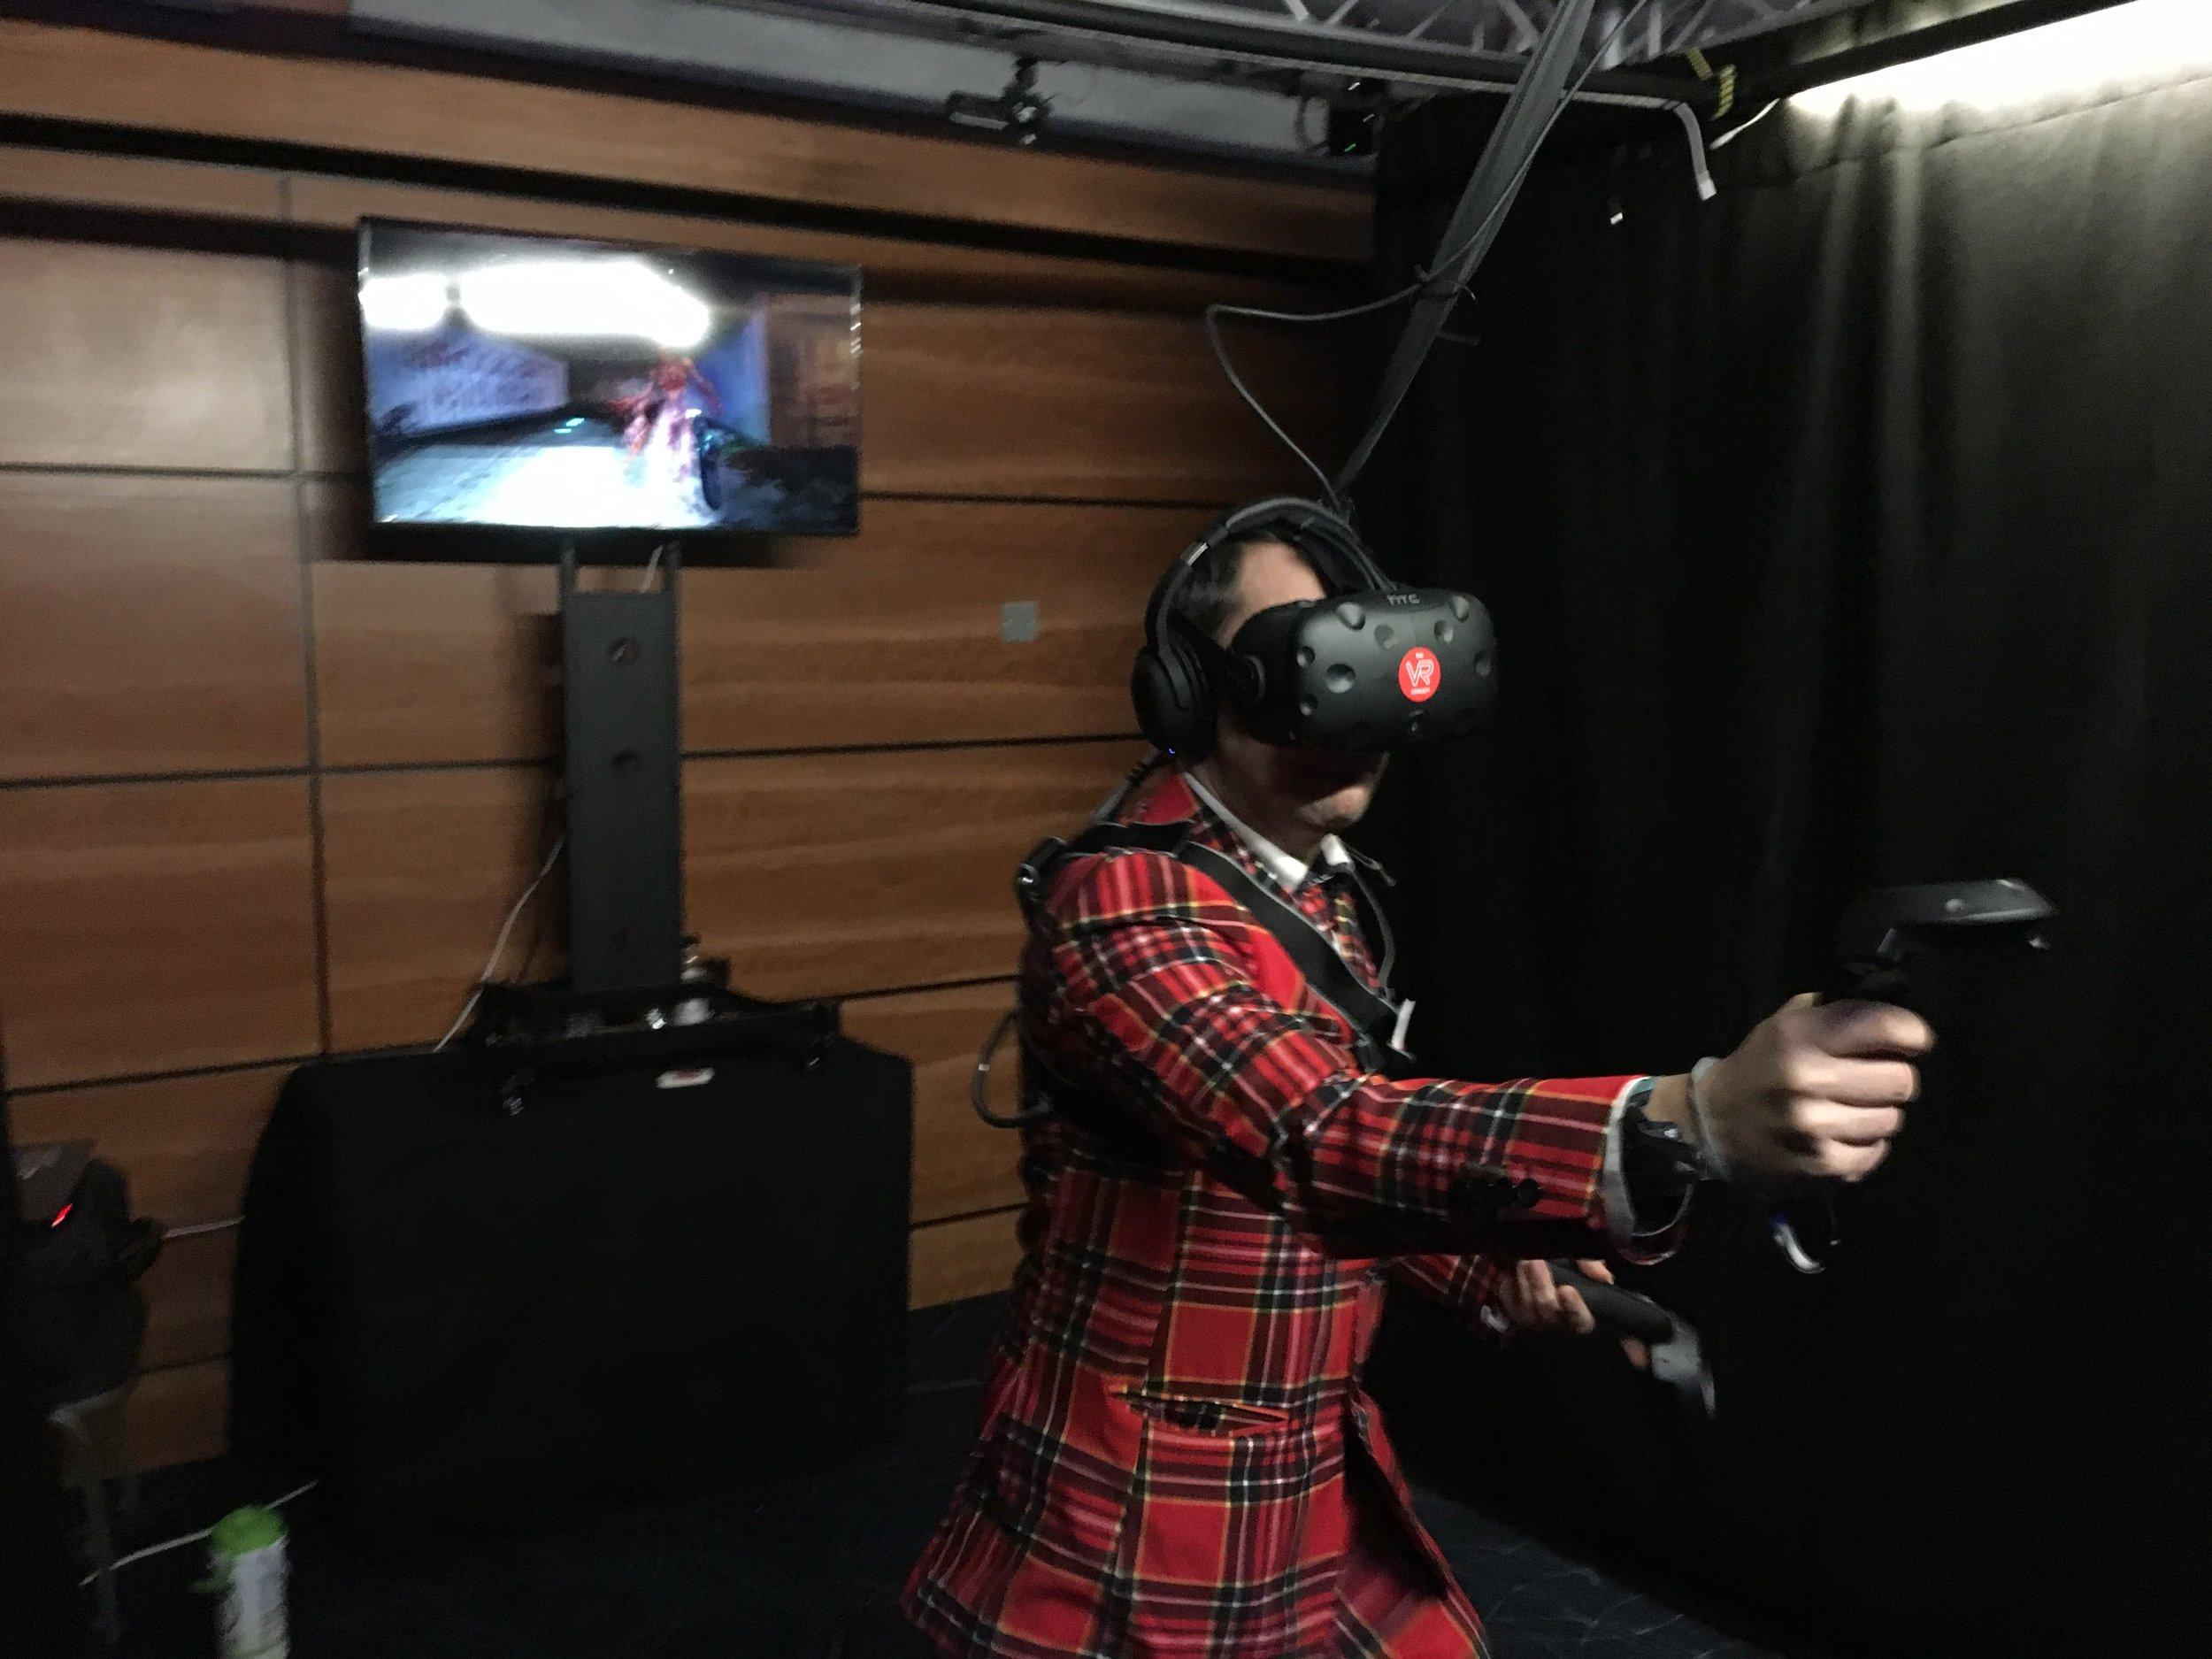 The_VR_Concept_BRITs_2017_tartan_customer.JPG